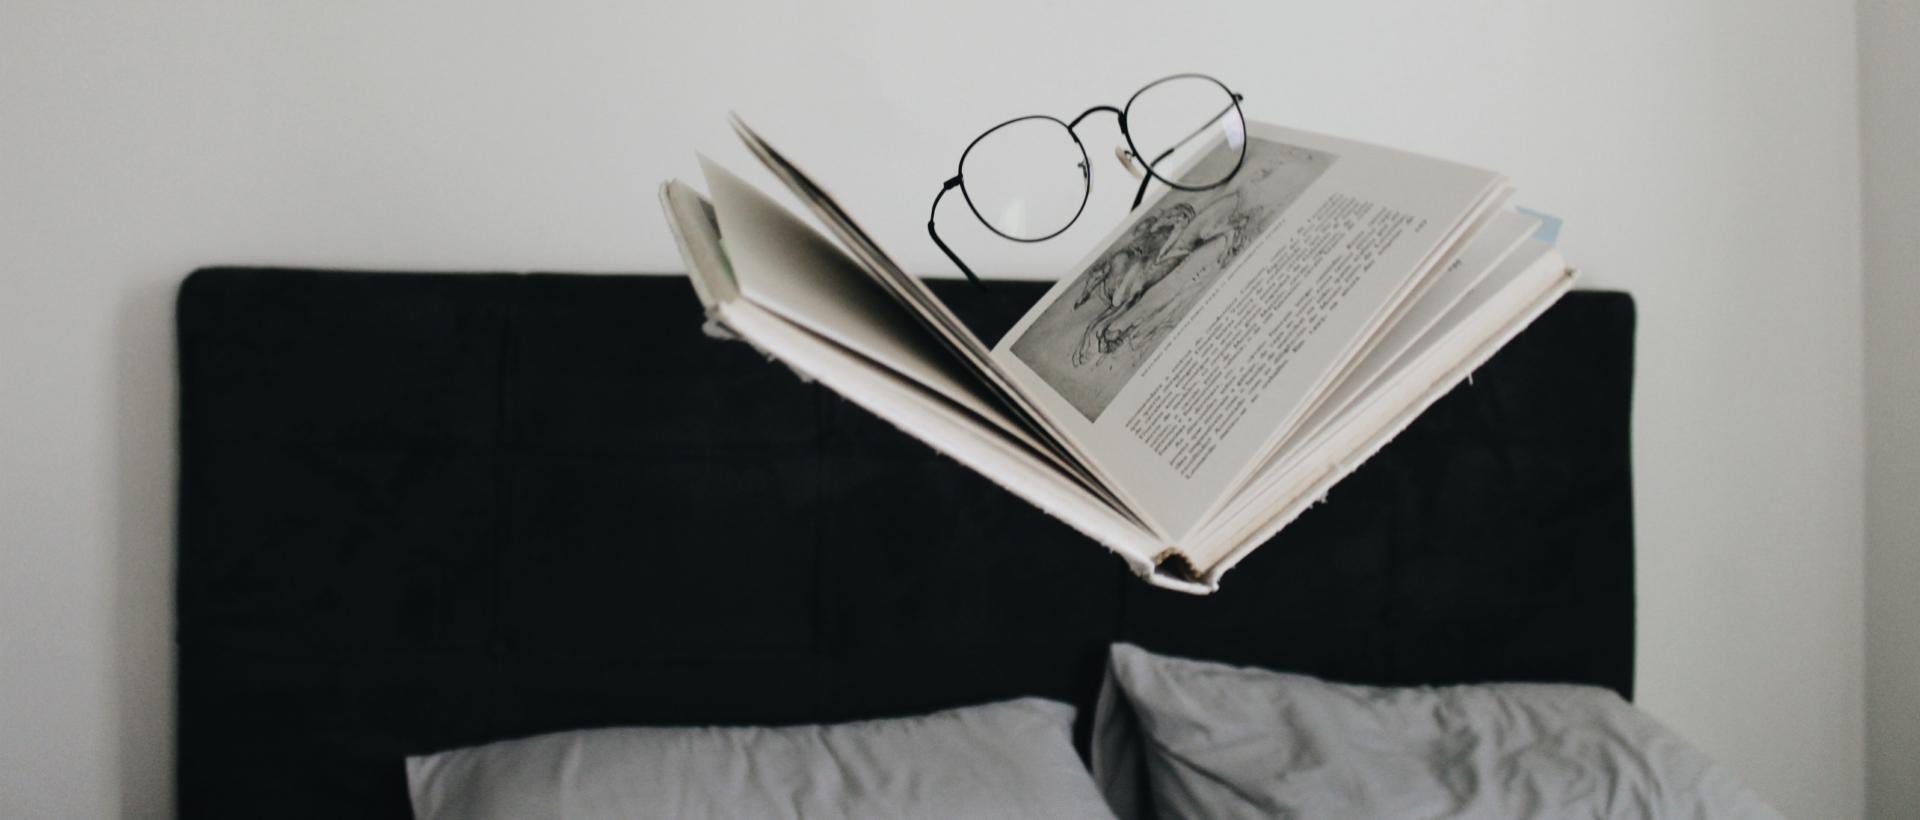 5 books to awaken your inner creative genius